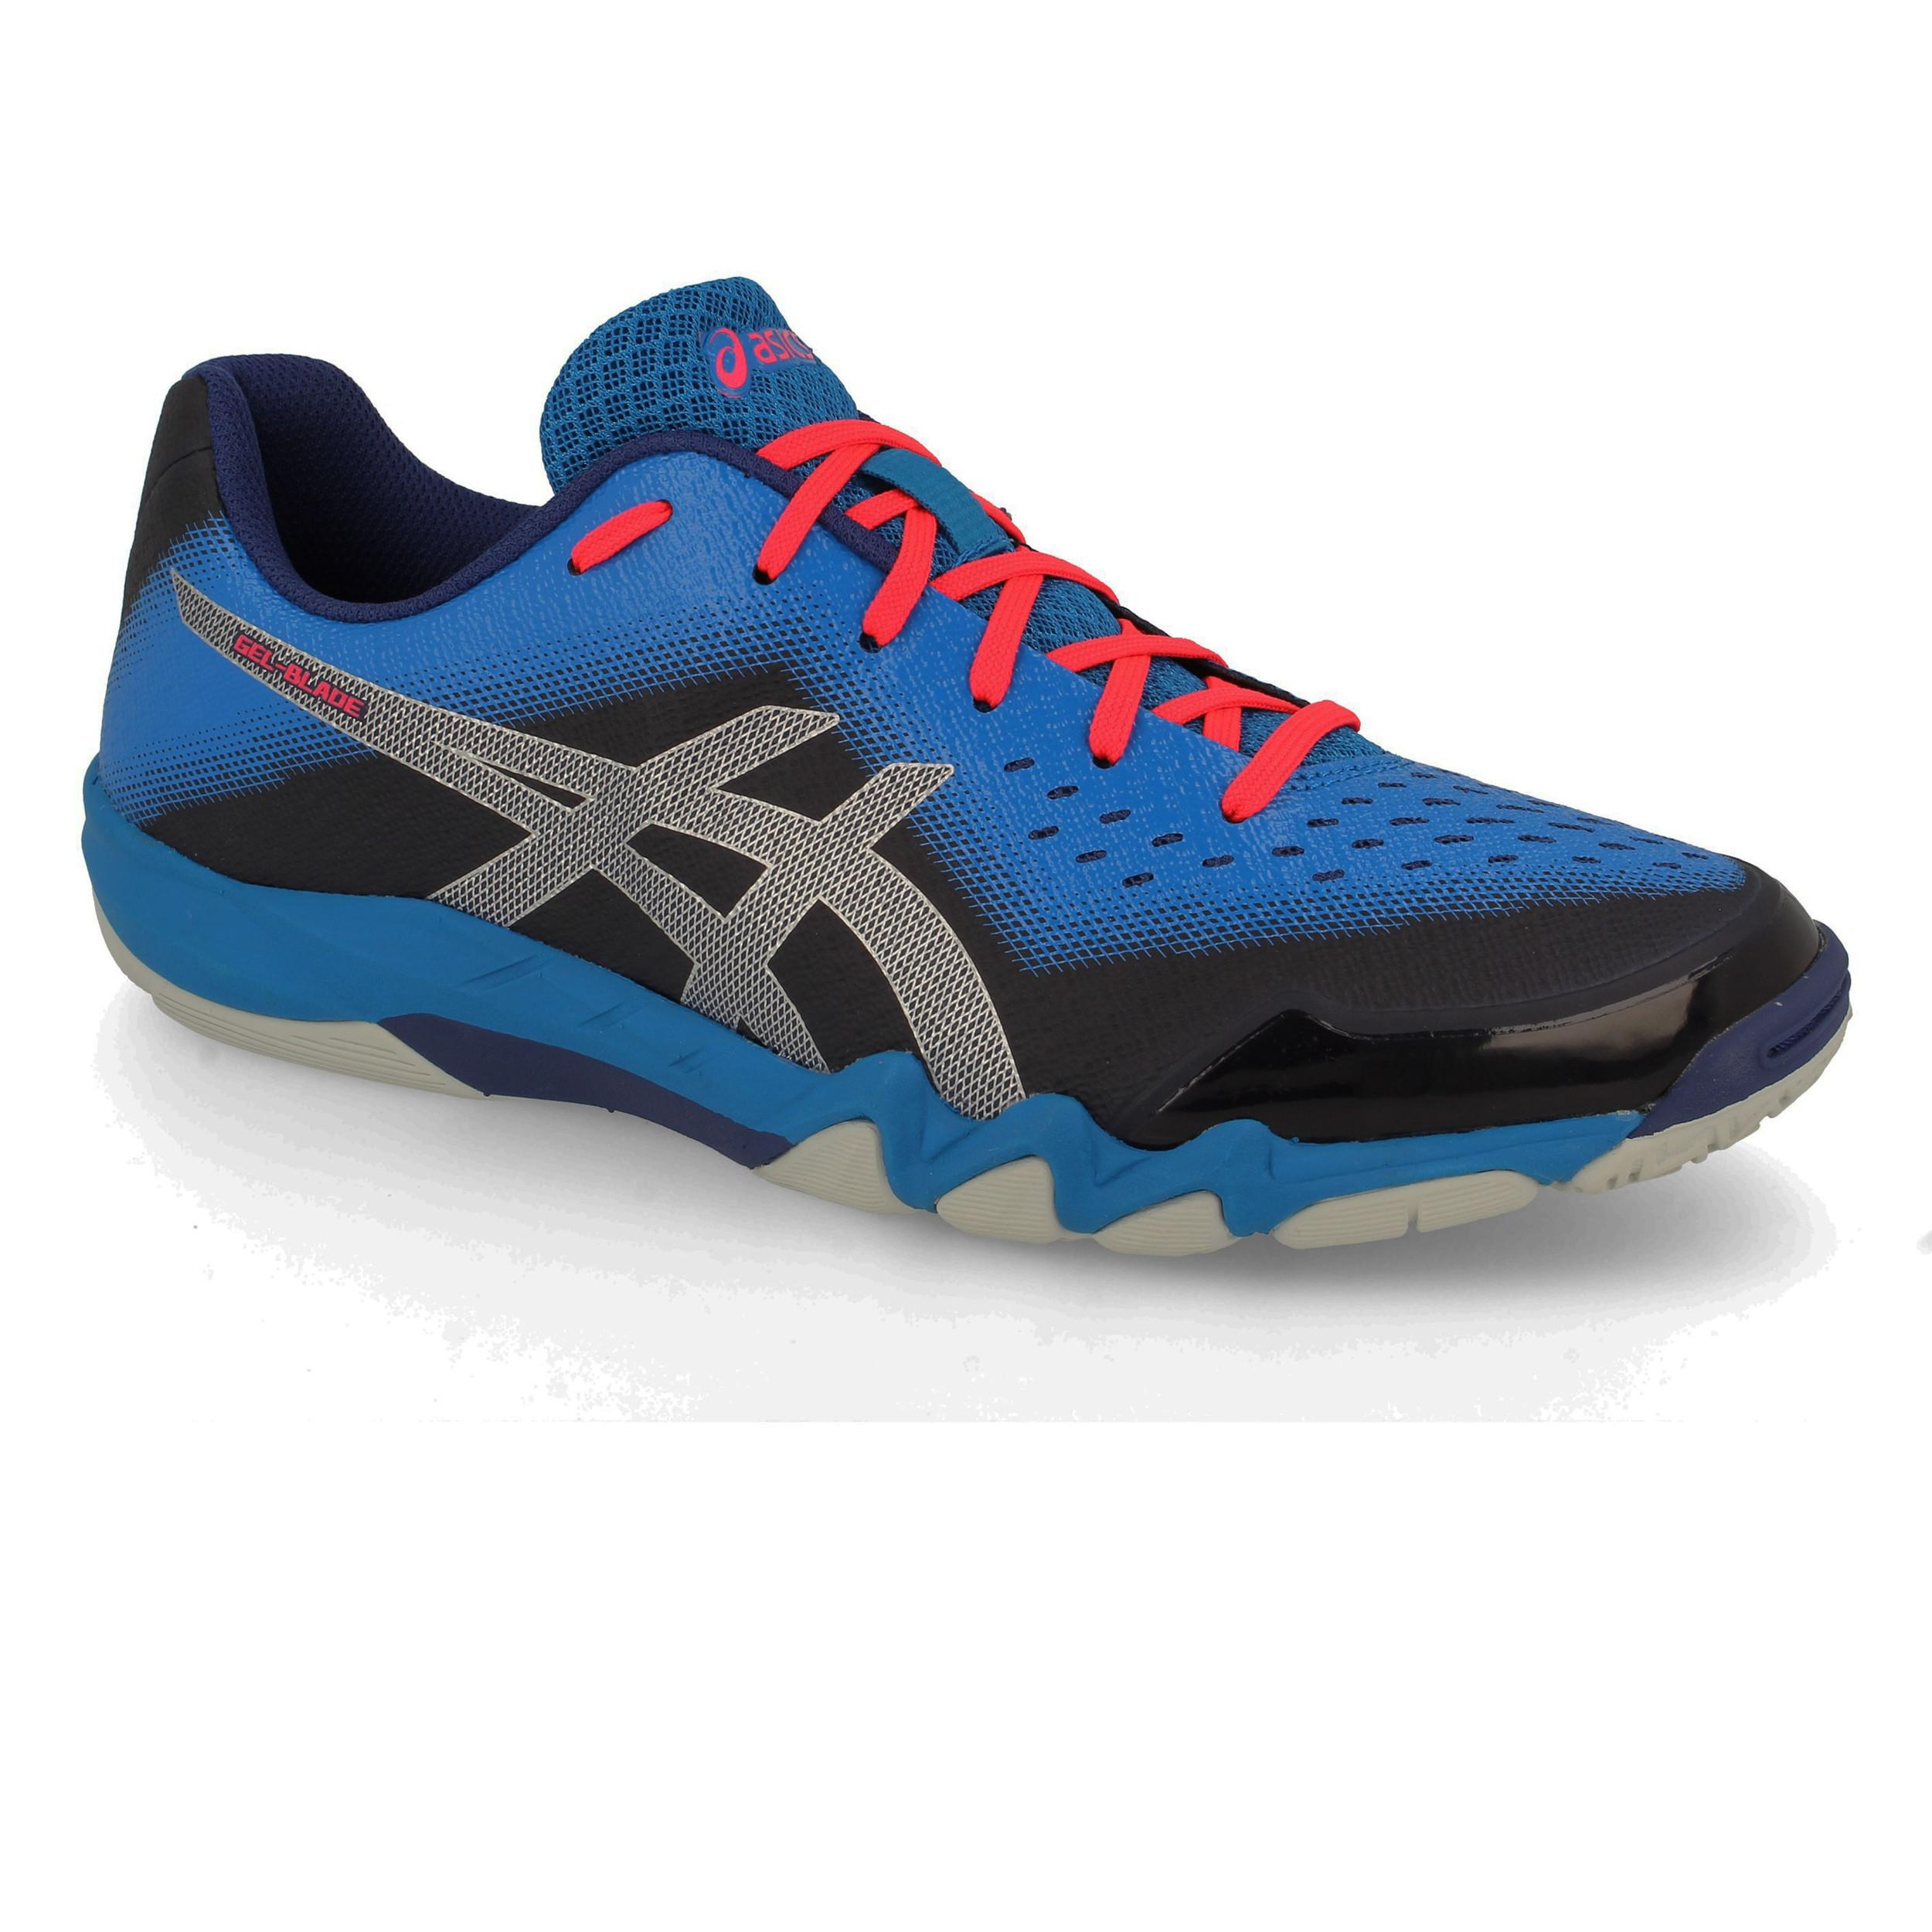 sale retailer 01031 65eeb Asics Hommes Gel-Blade 6 Chaussures De Sport En Salles Baskets Bleu Squash